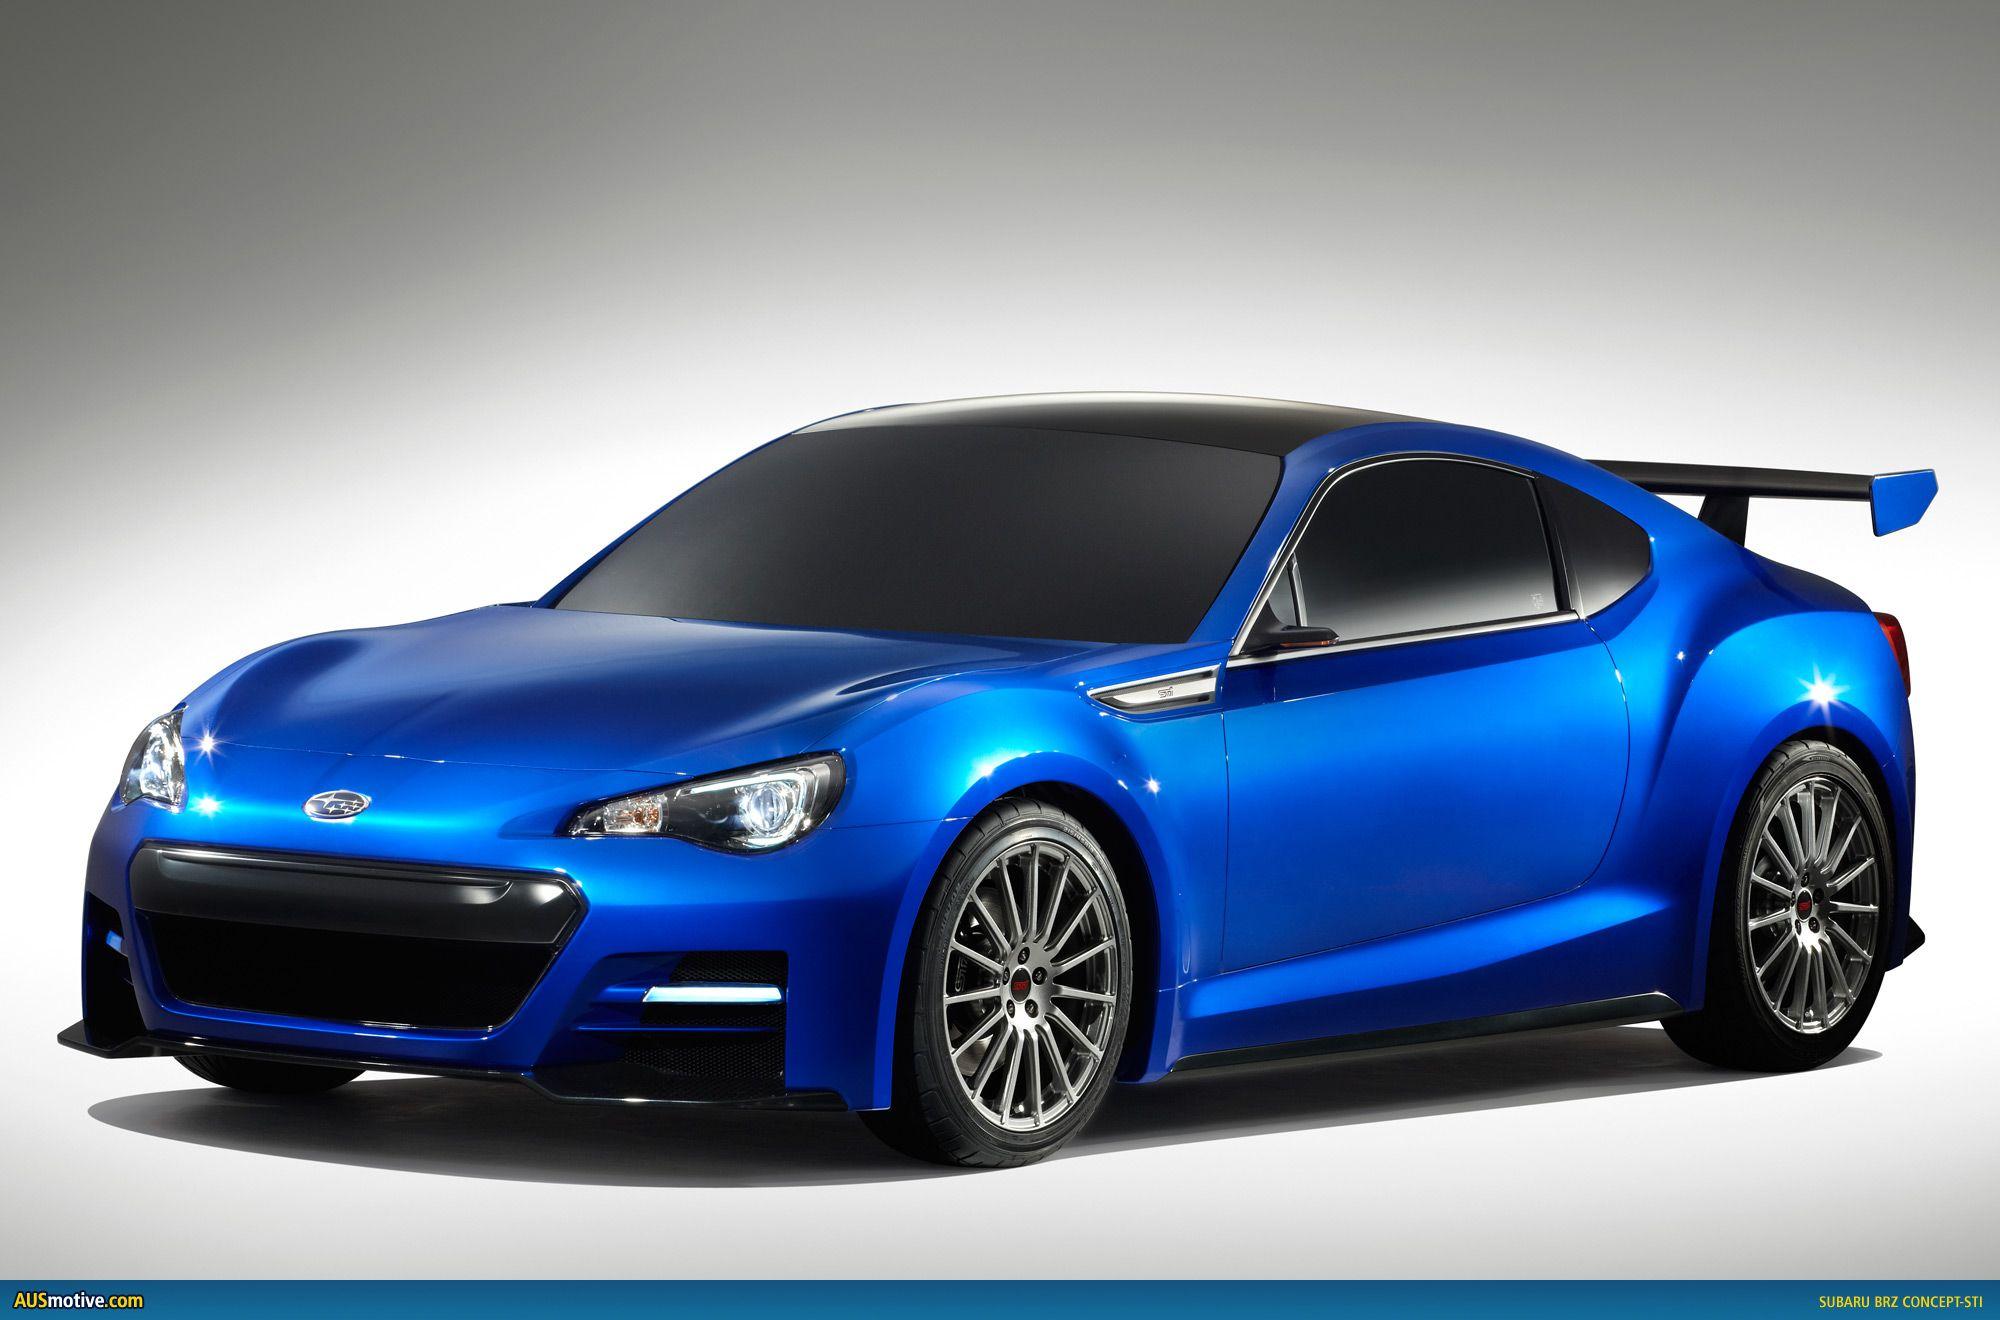 Subaru BRZ concept (With images) Subaru brz, Subaru brz